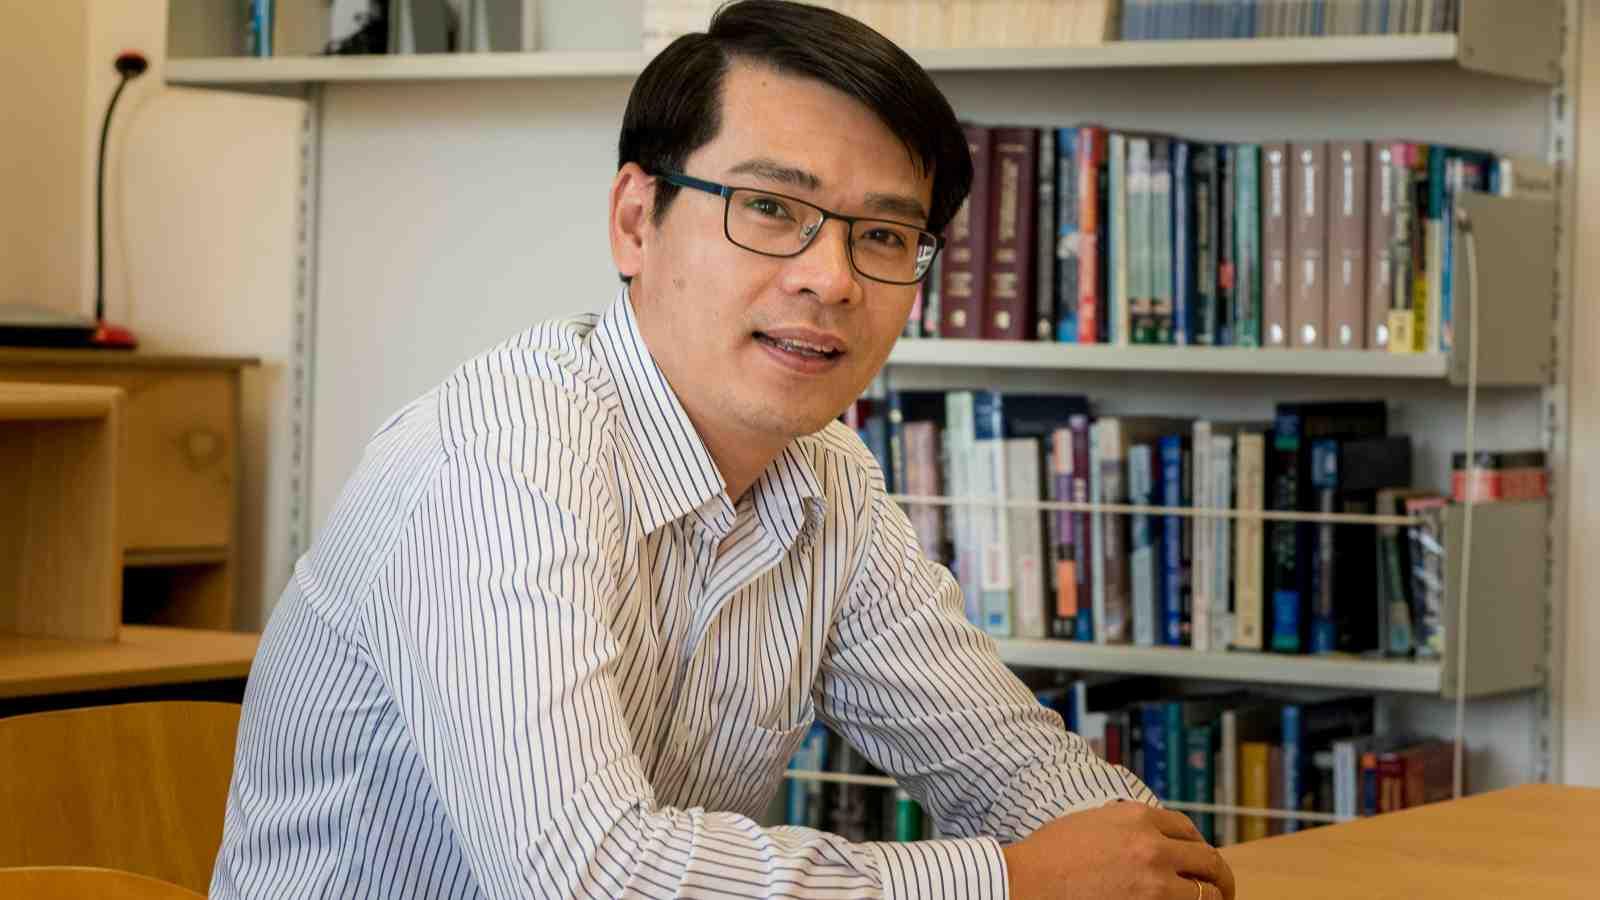 A profile image of PhD graduate, Dr Hoang Nguyen.